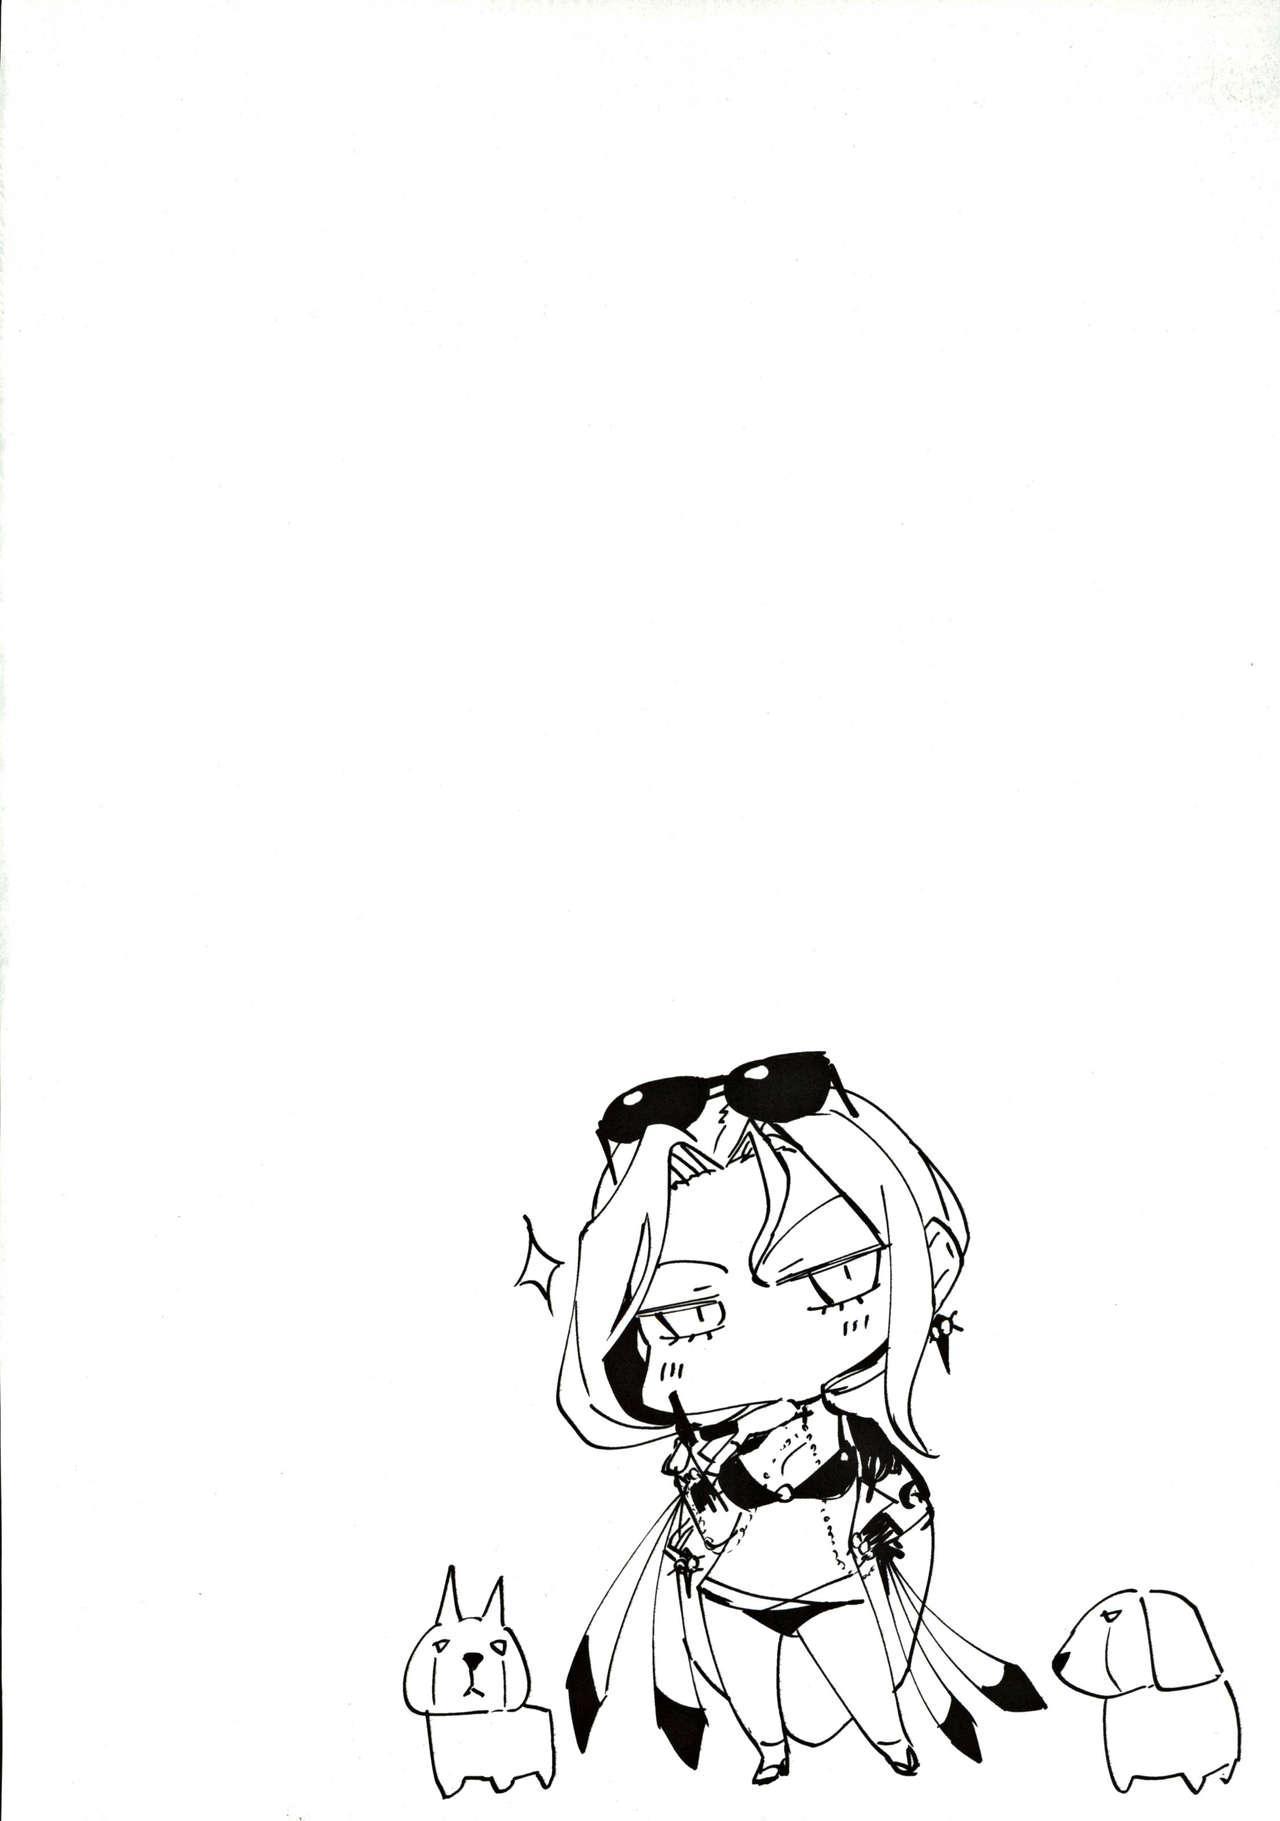 Carmilla-san no Ecchi na no ga Kakitakatta Hon | I Wanted To Draw A Book About Carmilla's Sexiness 2